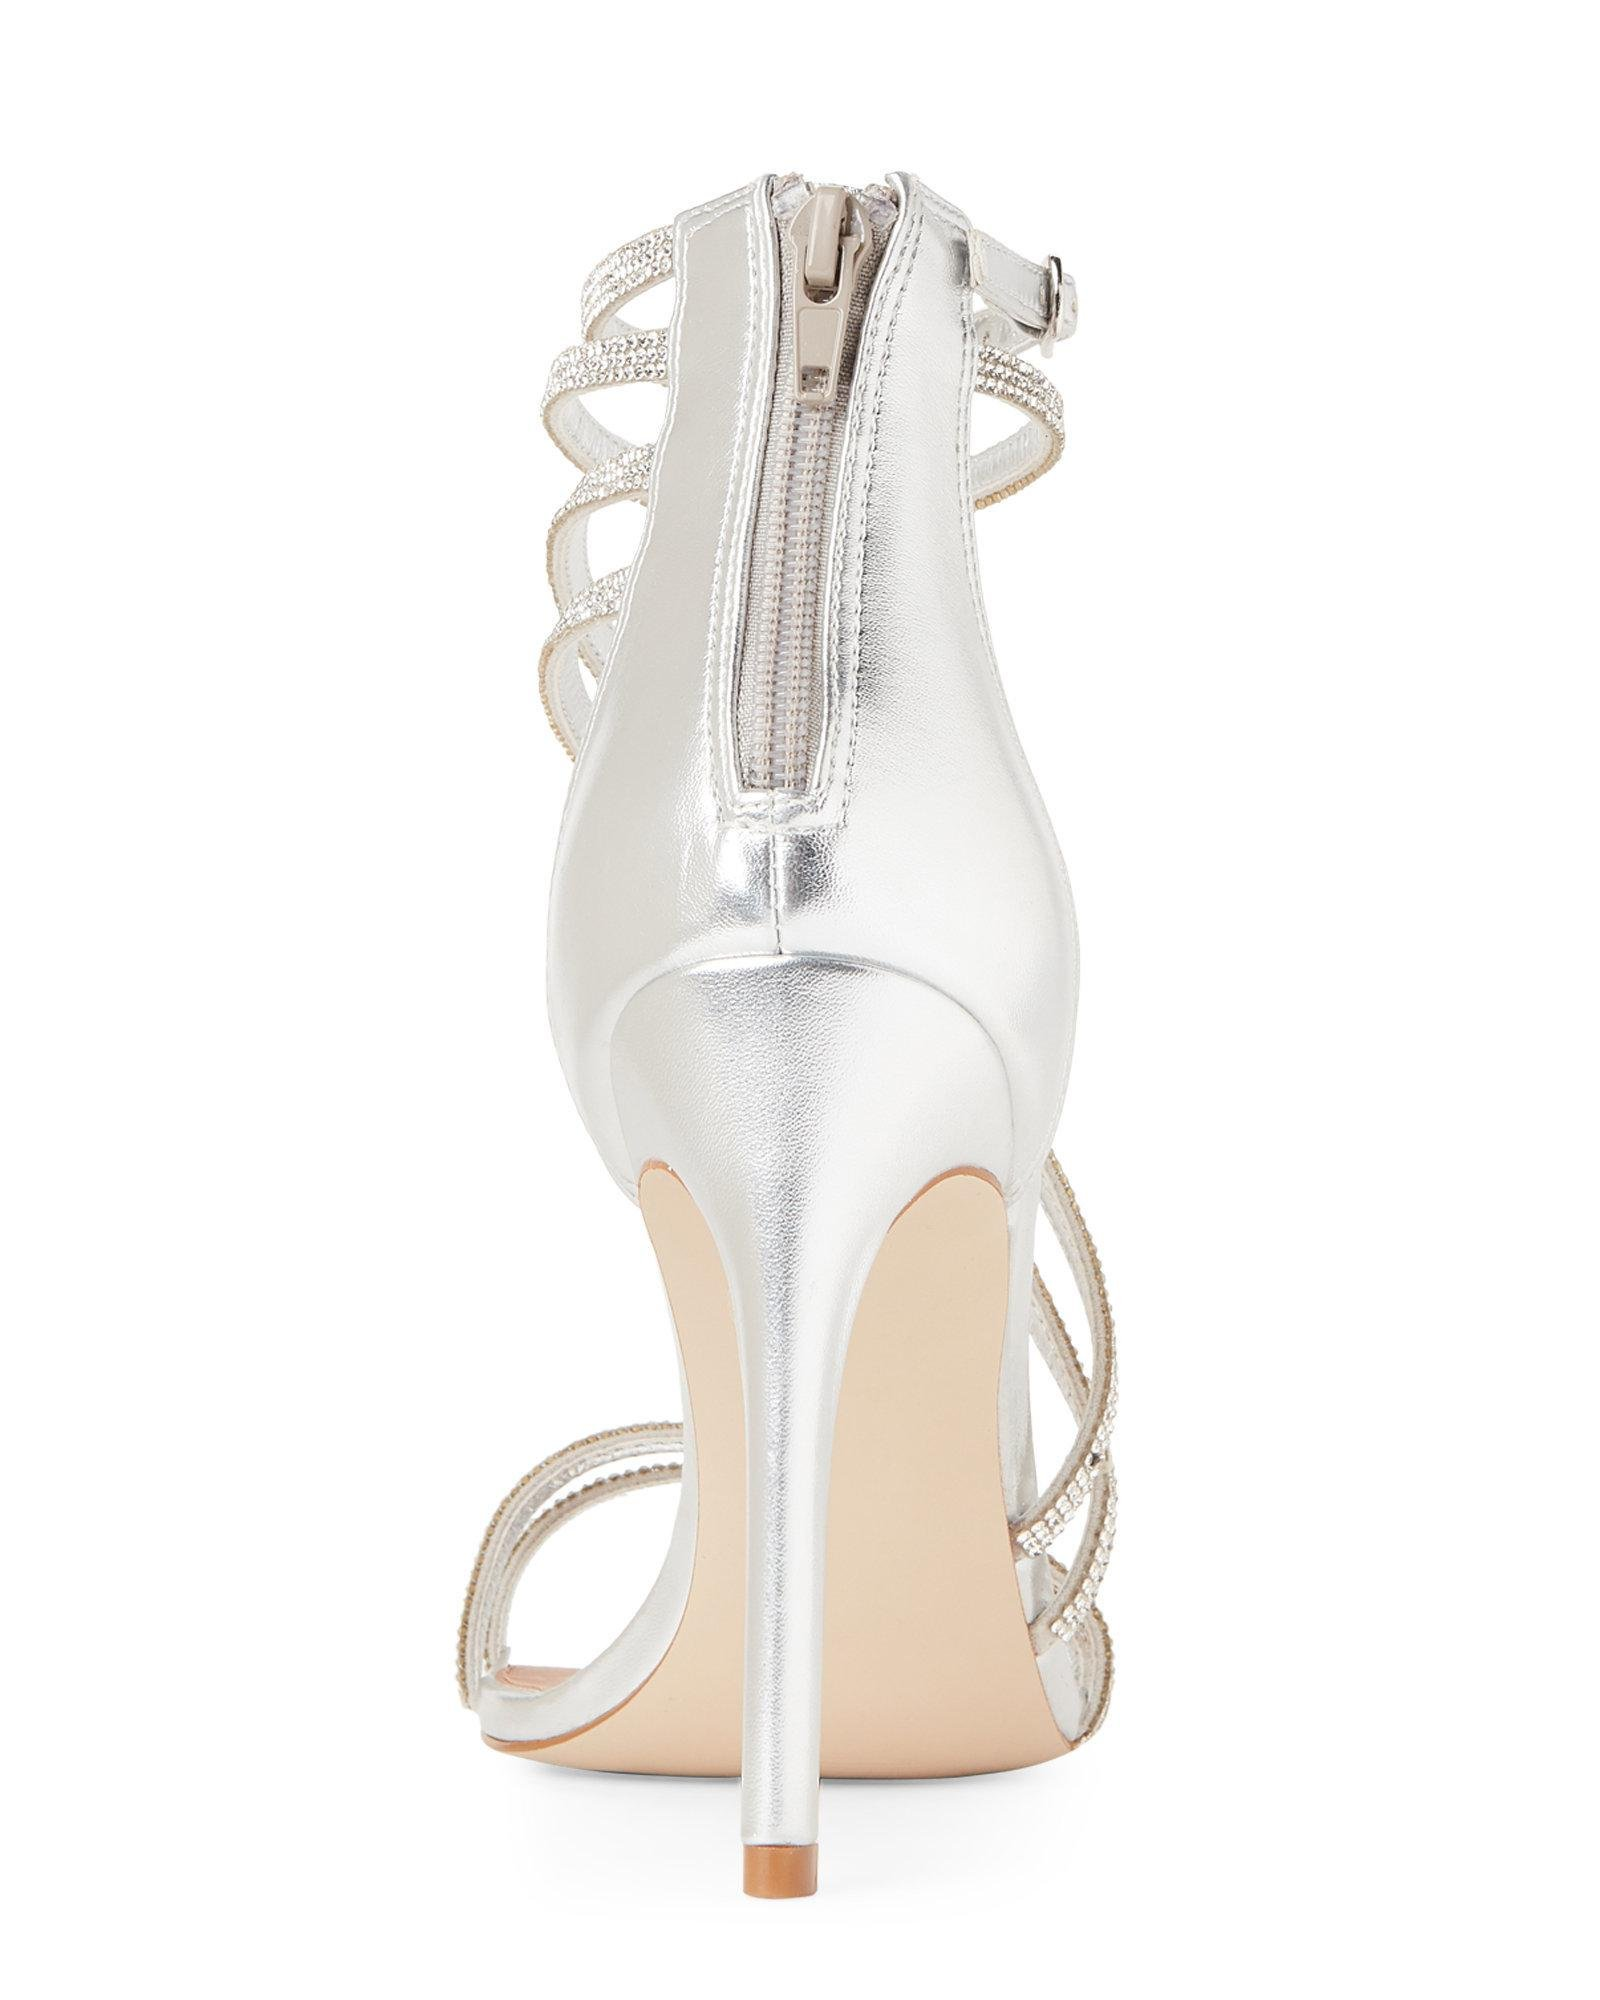 ce57c31d7d2 Steve Madden Metallic Pewter Fiffi Embellished Strappy Sandals